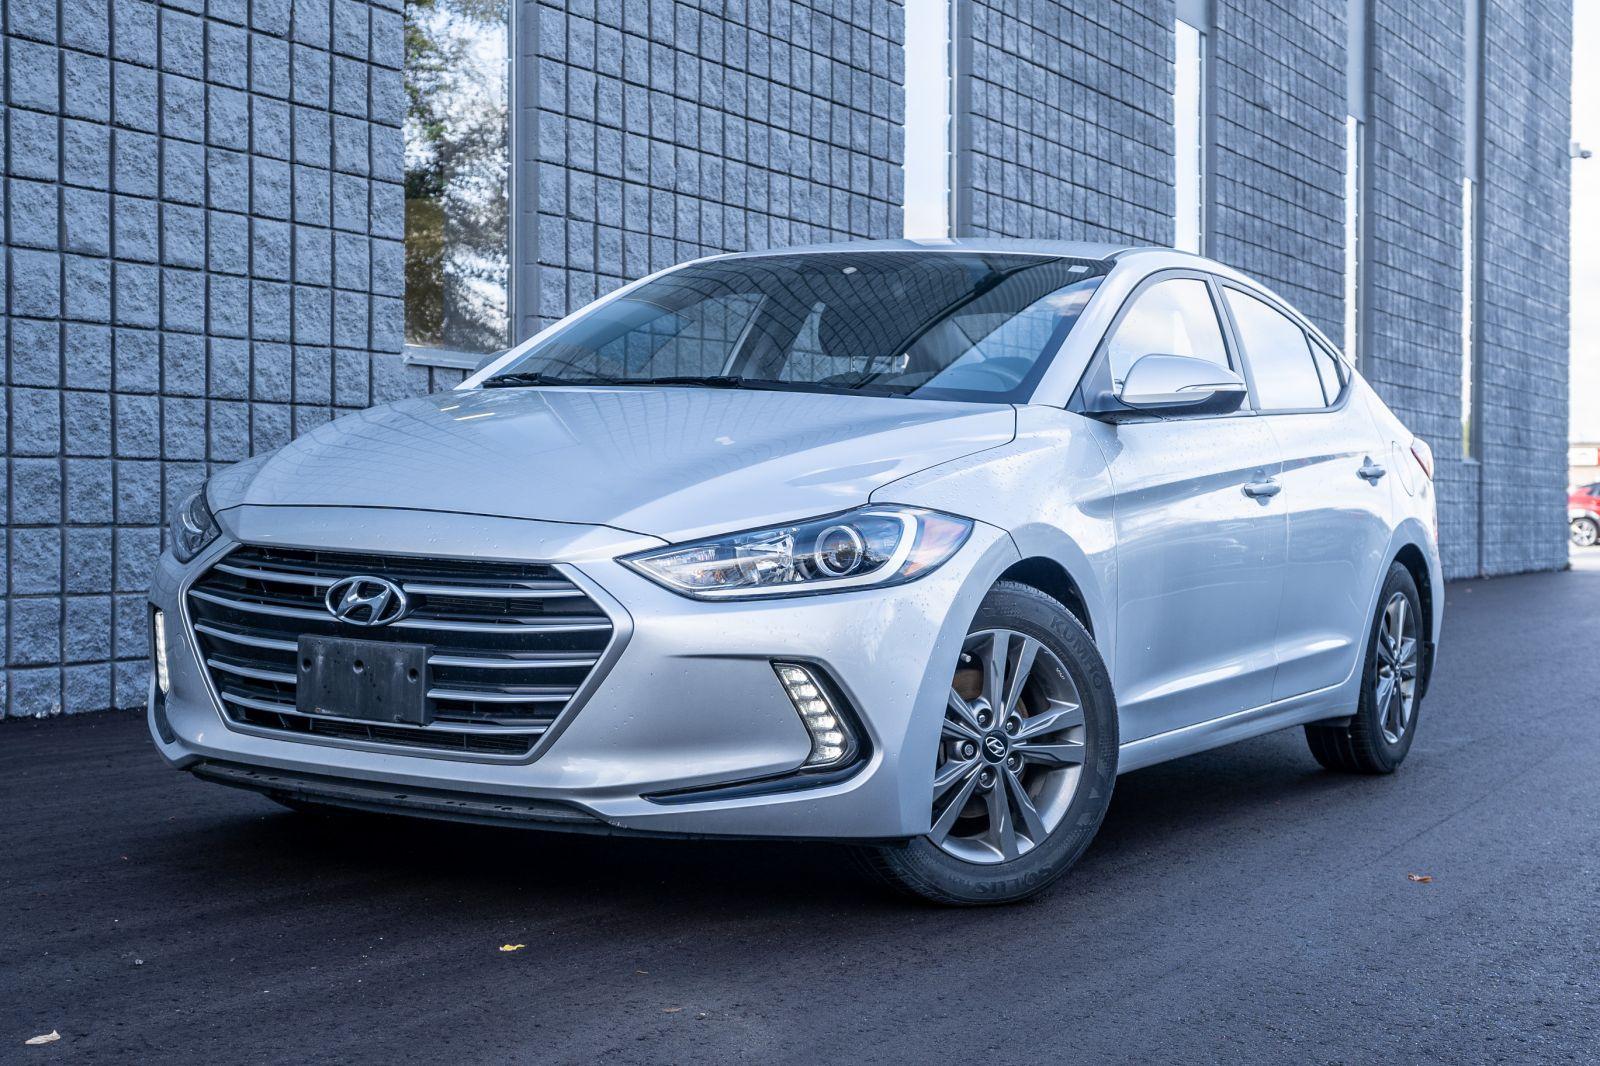 2017 Hyundai Elantra Image